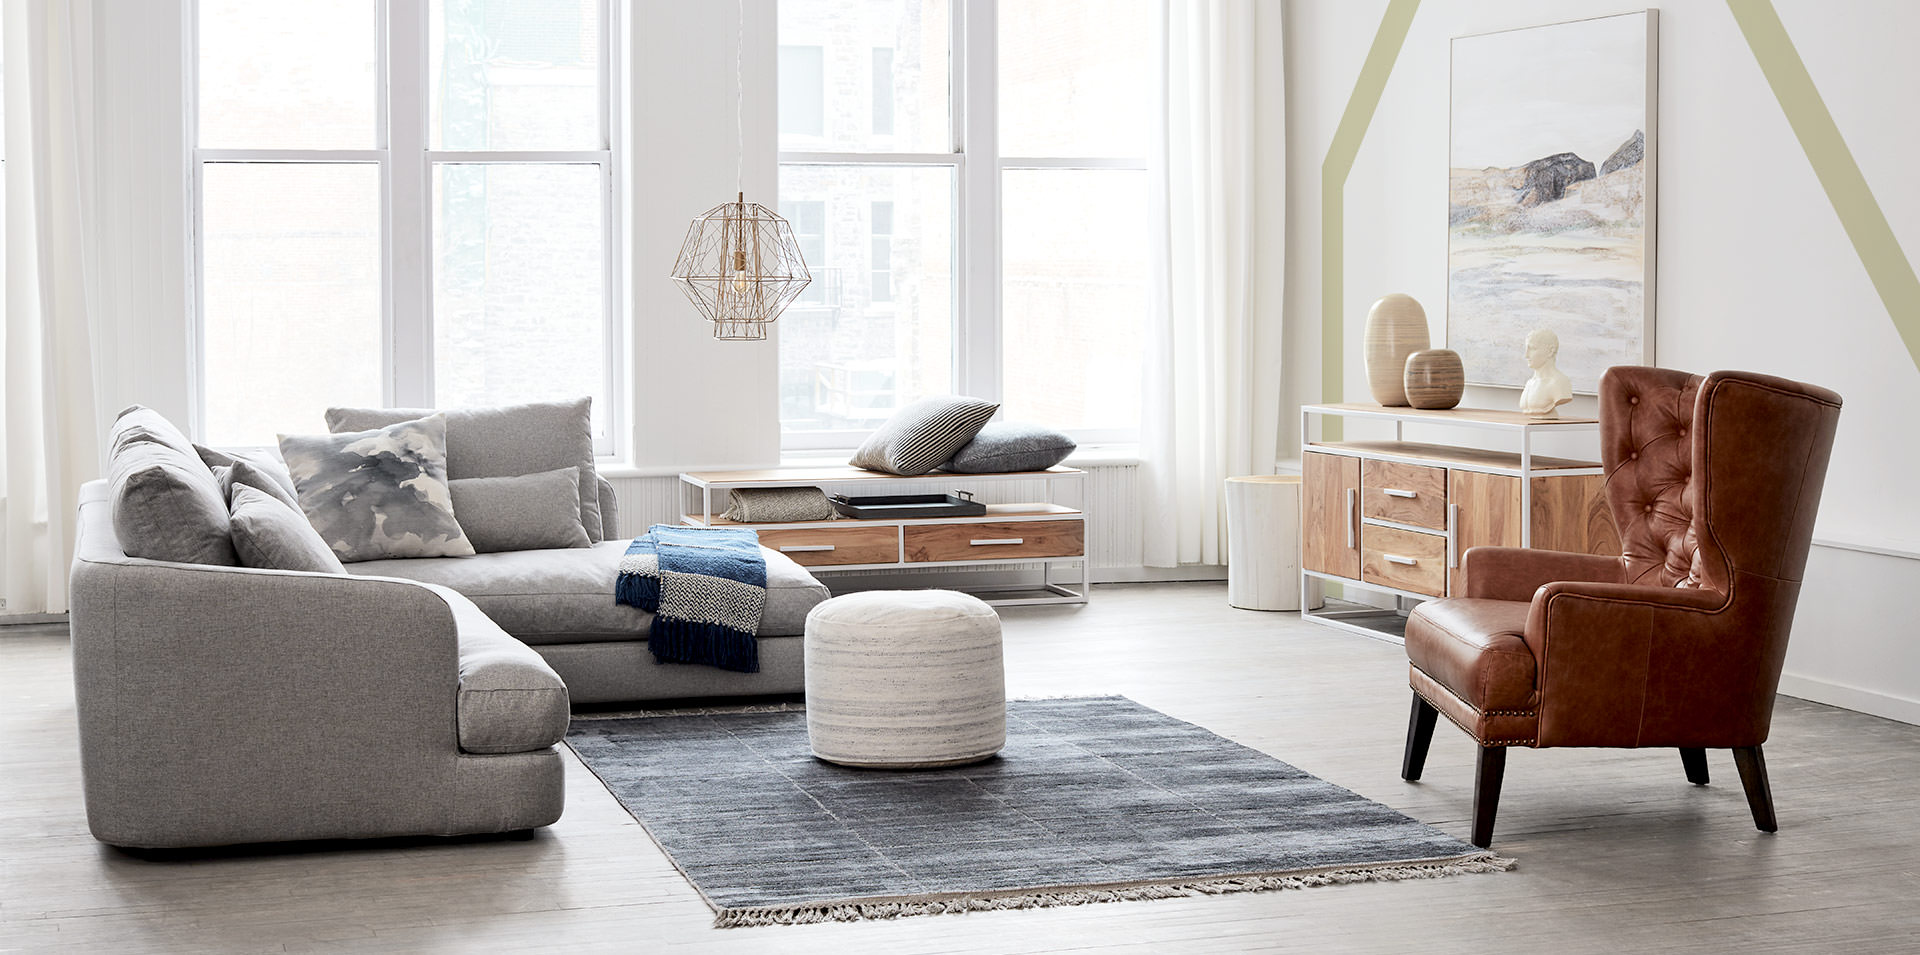 Meubles de chambre coucher modernes mobilia for Mobilia normal